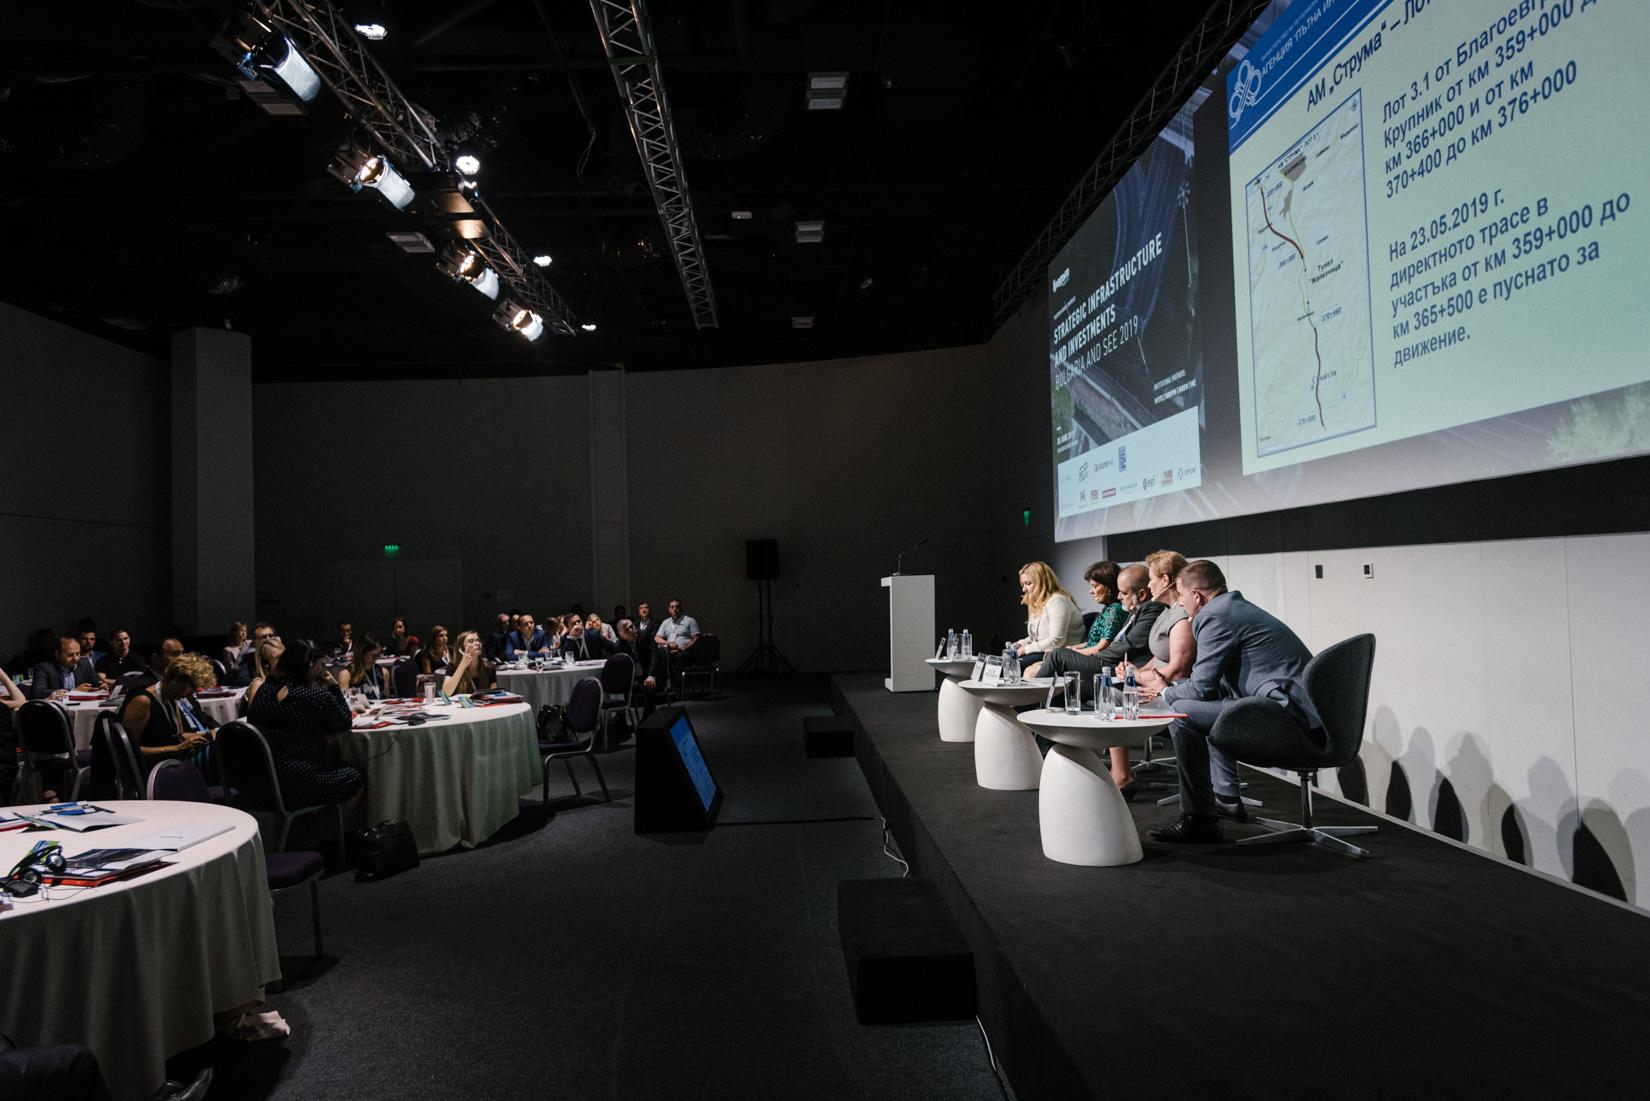 Infrastructure_conference_2019_DSC_3596.jpg